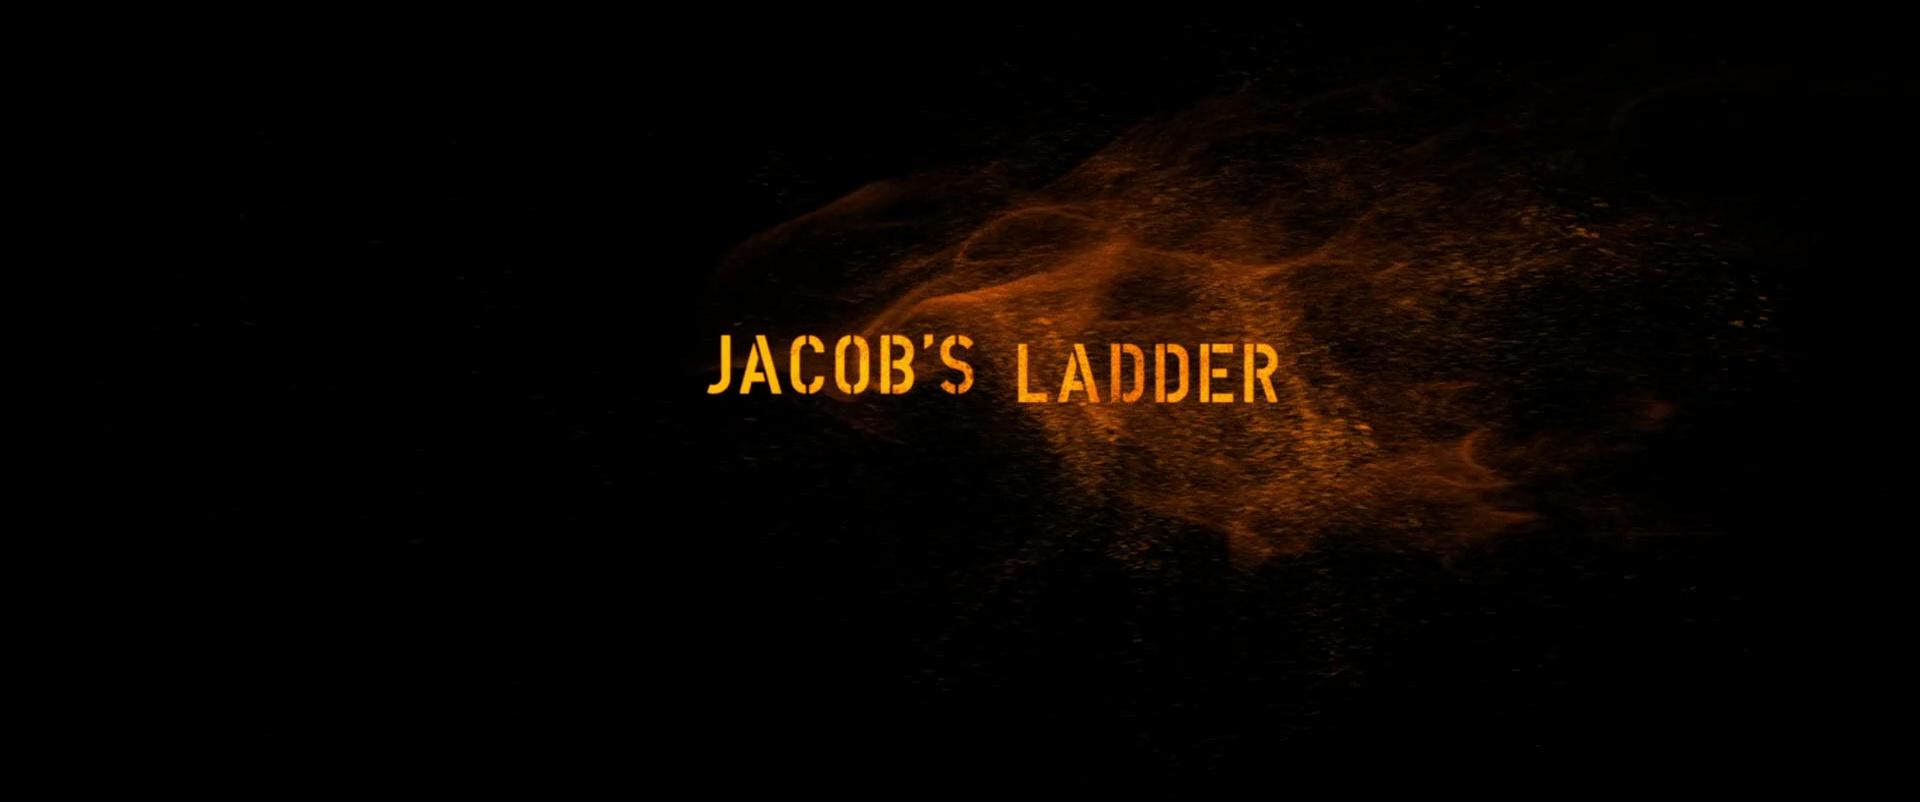 JACOB'S LADDER de David M. Rosenthal (2019)